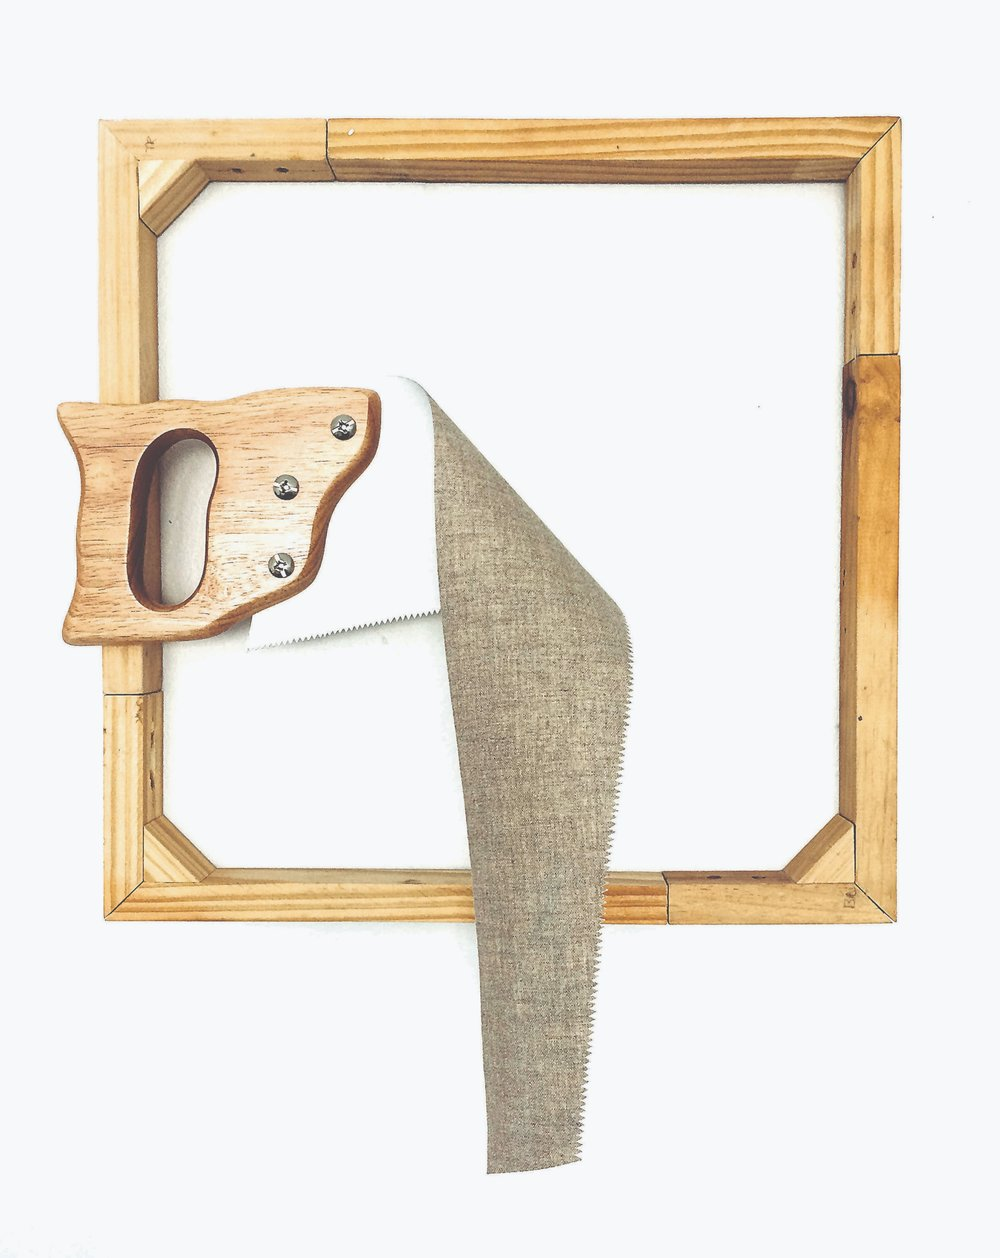 UNTITLED   linen, saligna, pine and metal screws  30 x 45cm  2017